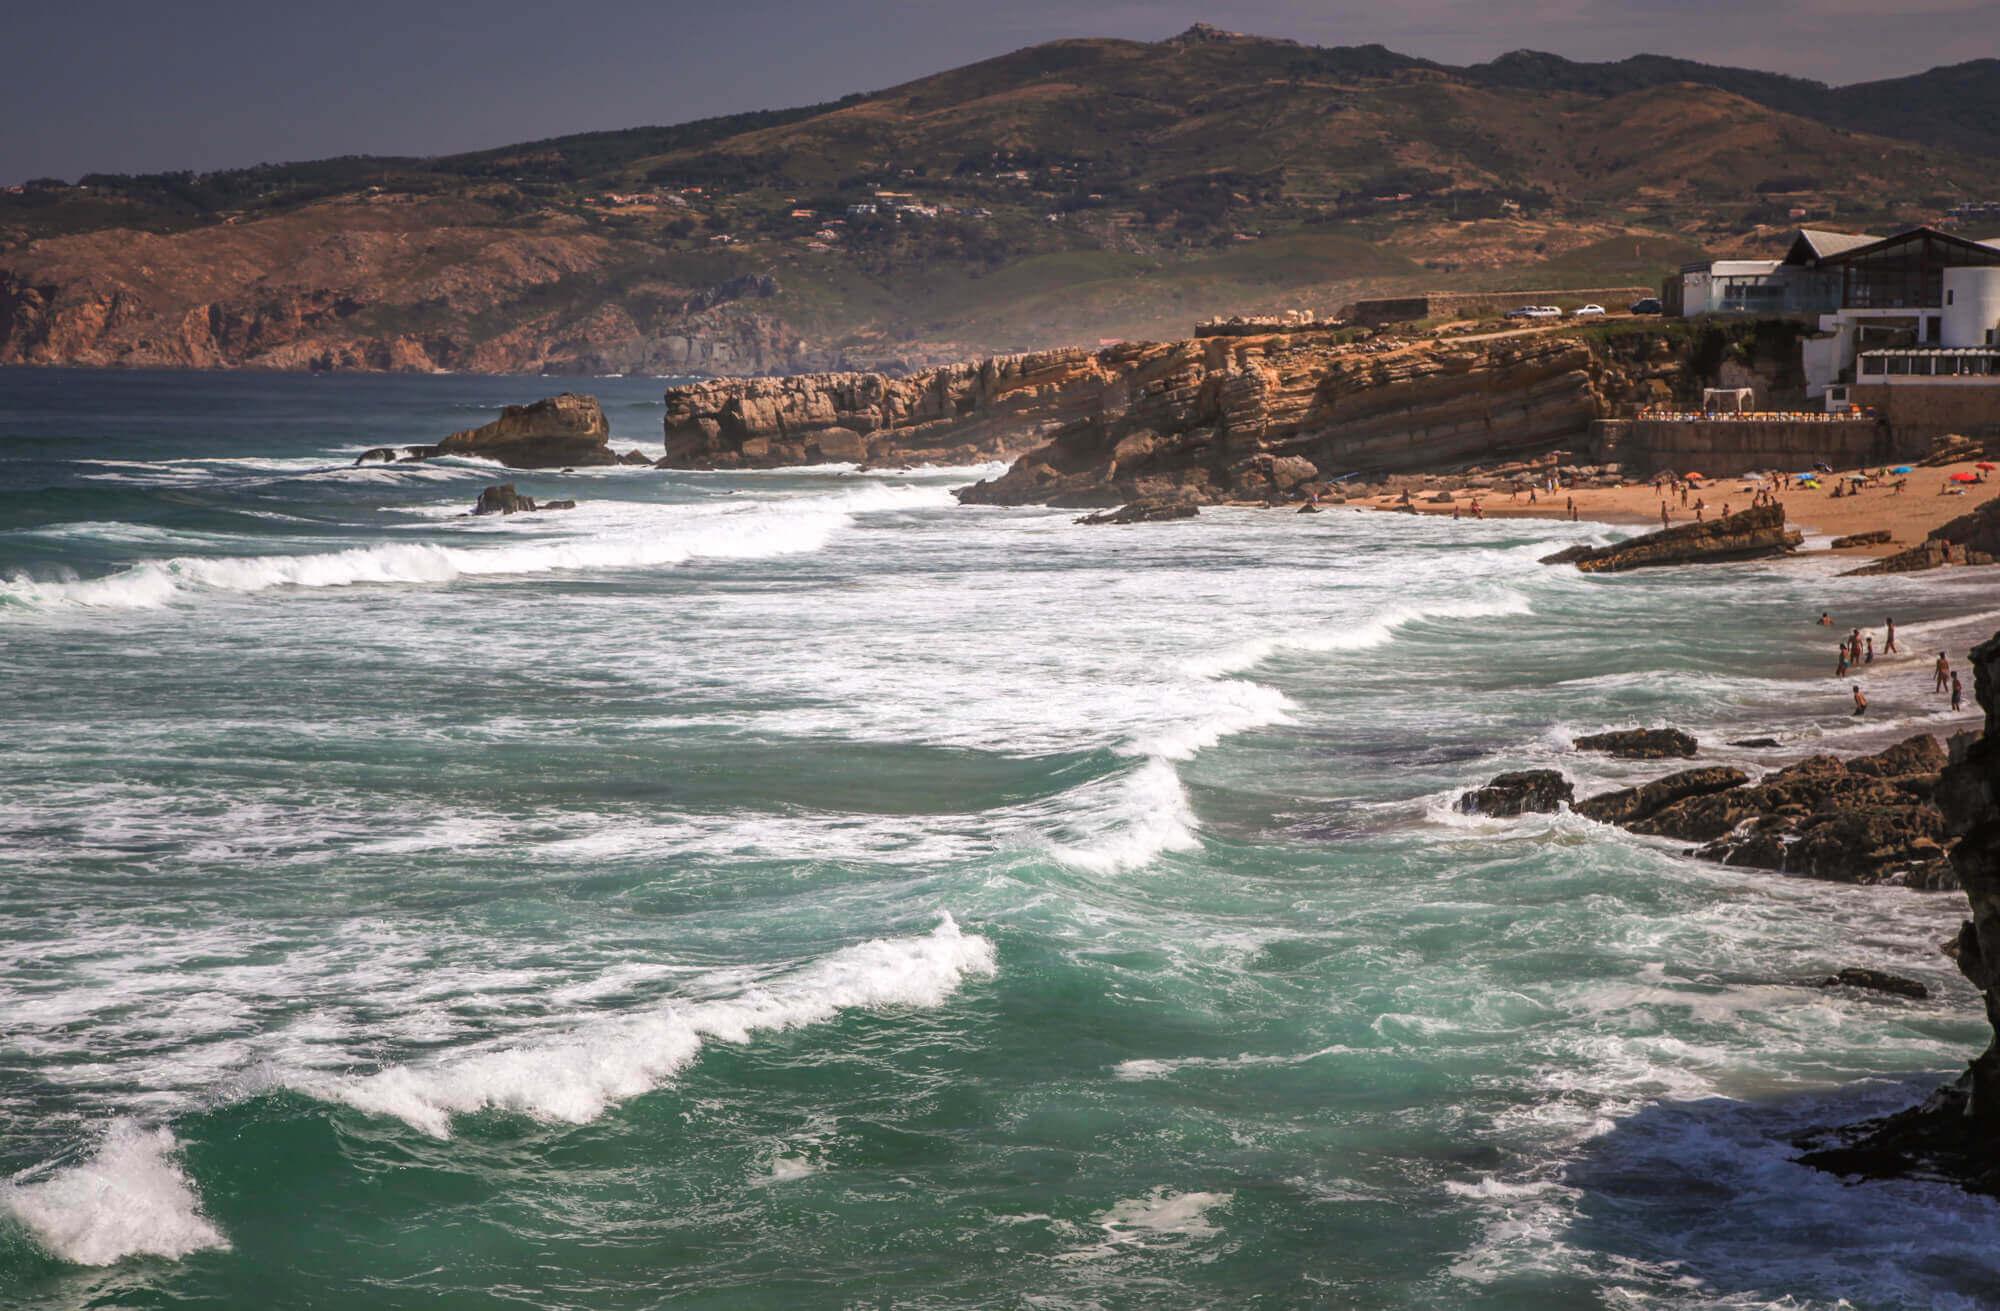 Praia do Guincho coastline